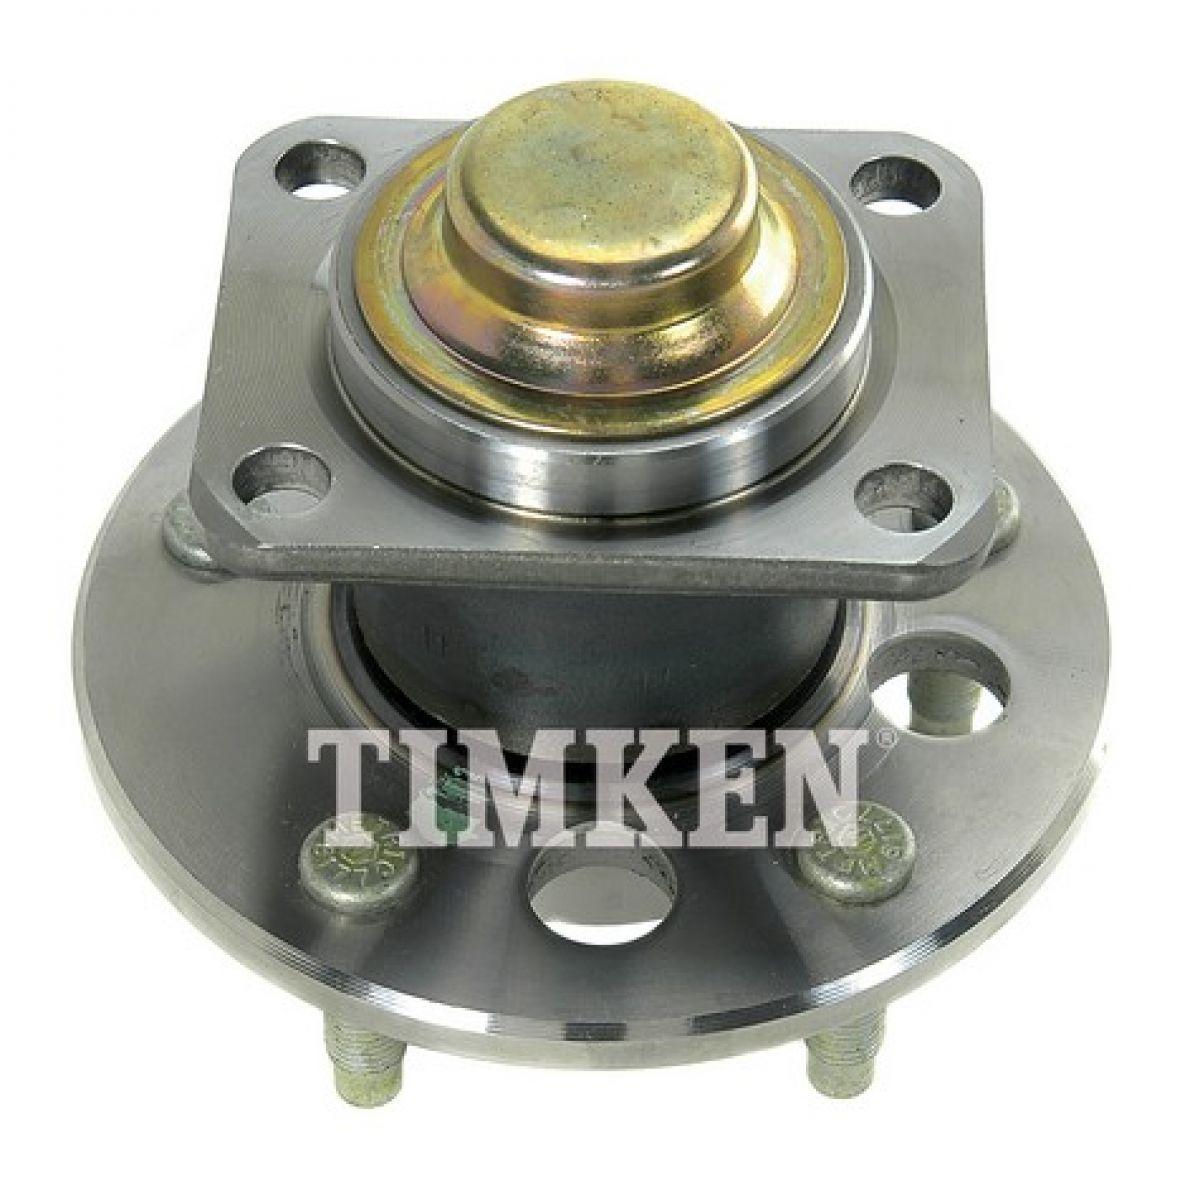 2003 Buick Century Wheel Bearing: Rear Wheel Hub & Bearing TIMKEN For Buick Chevy Pontiac